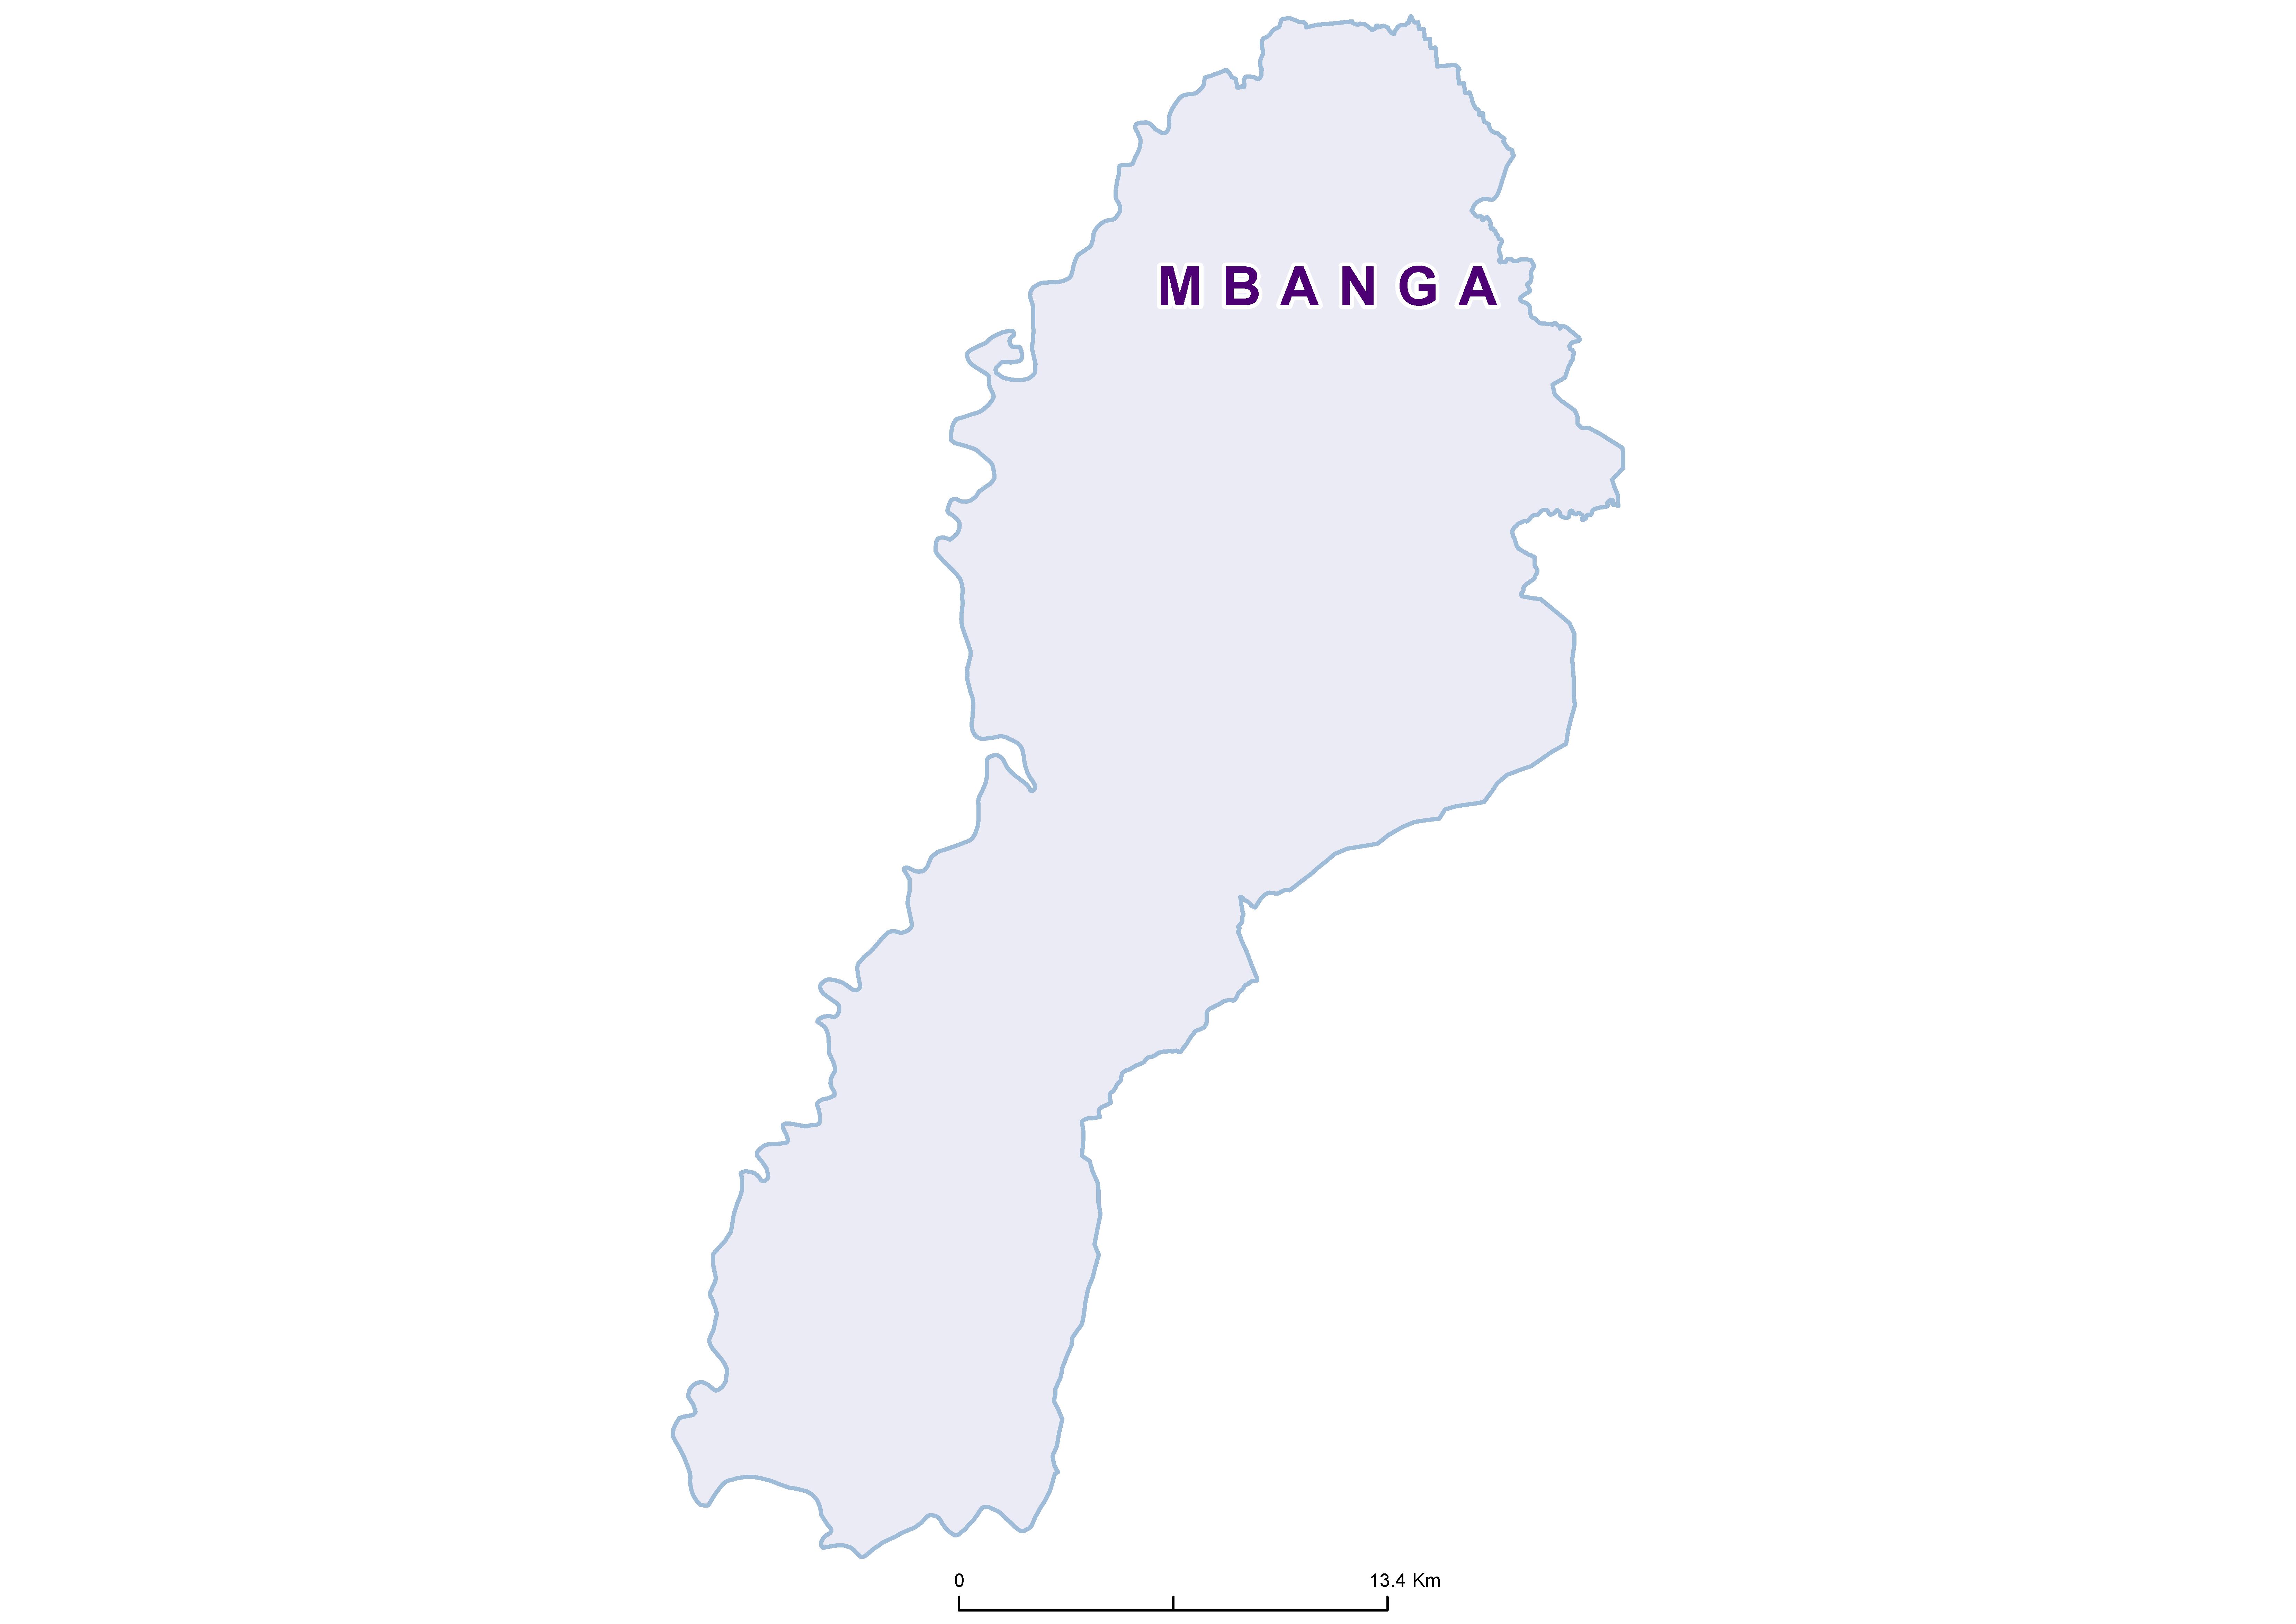 Mbanga Mean SCH 20180001